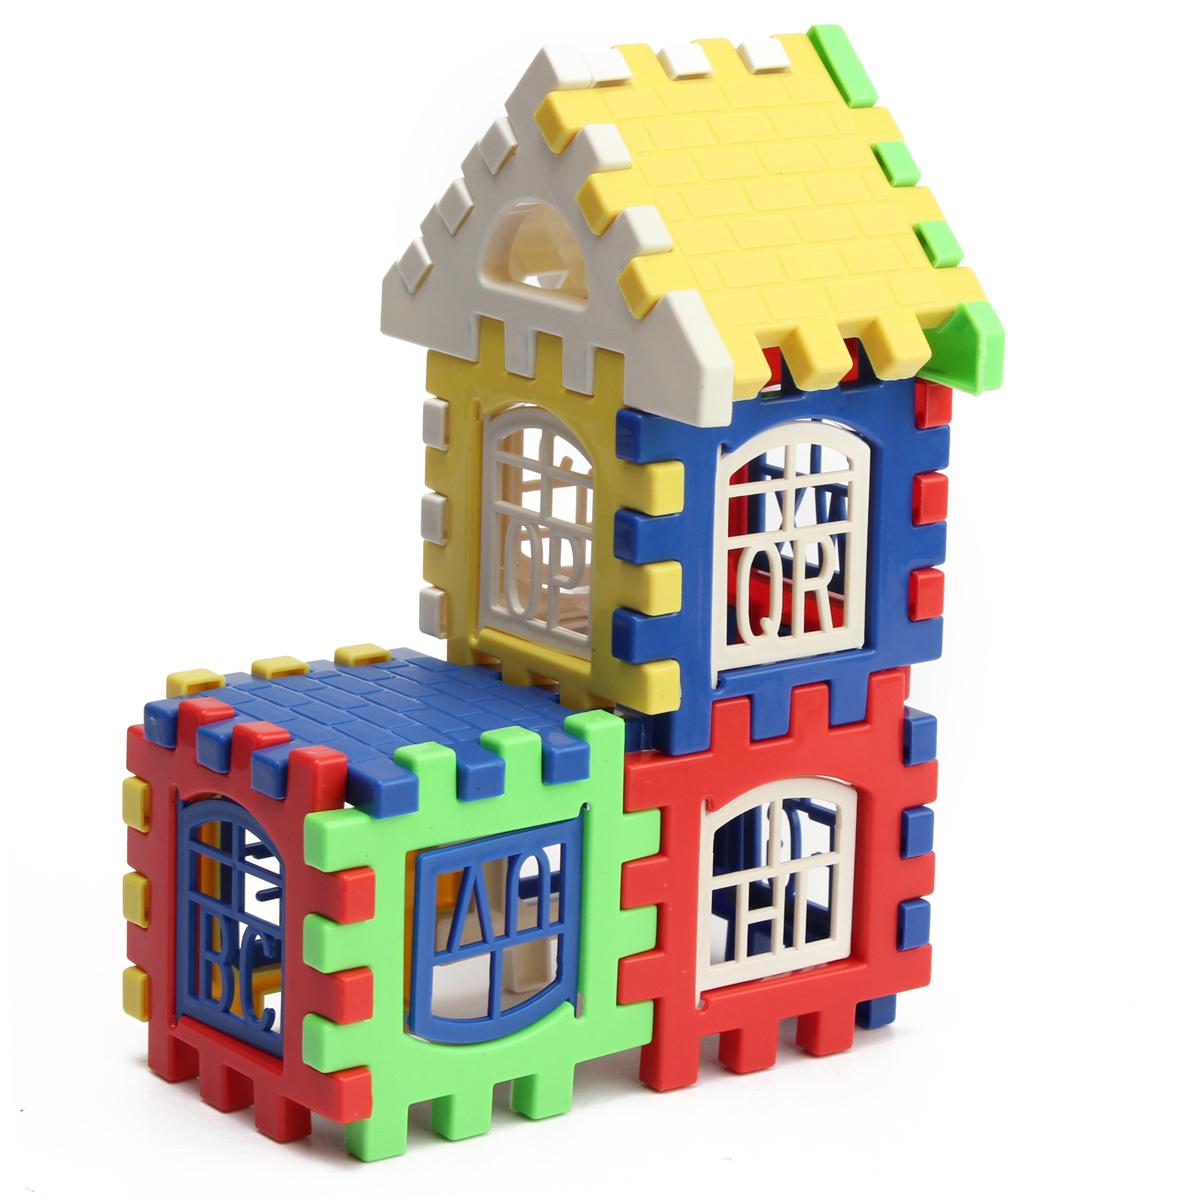 Building Toys For Babies : Pcs baby kid children house building blocks construction